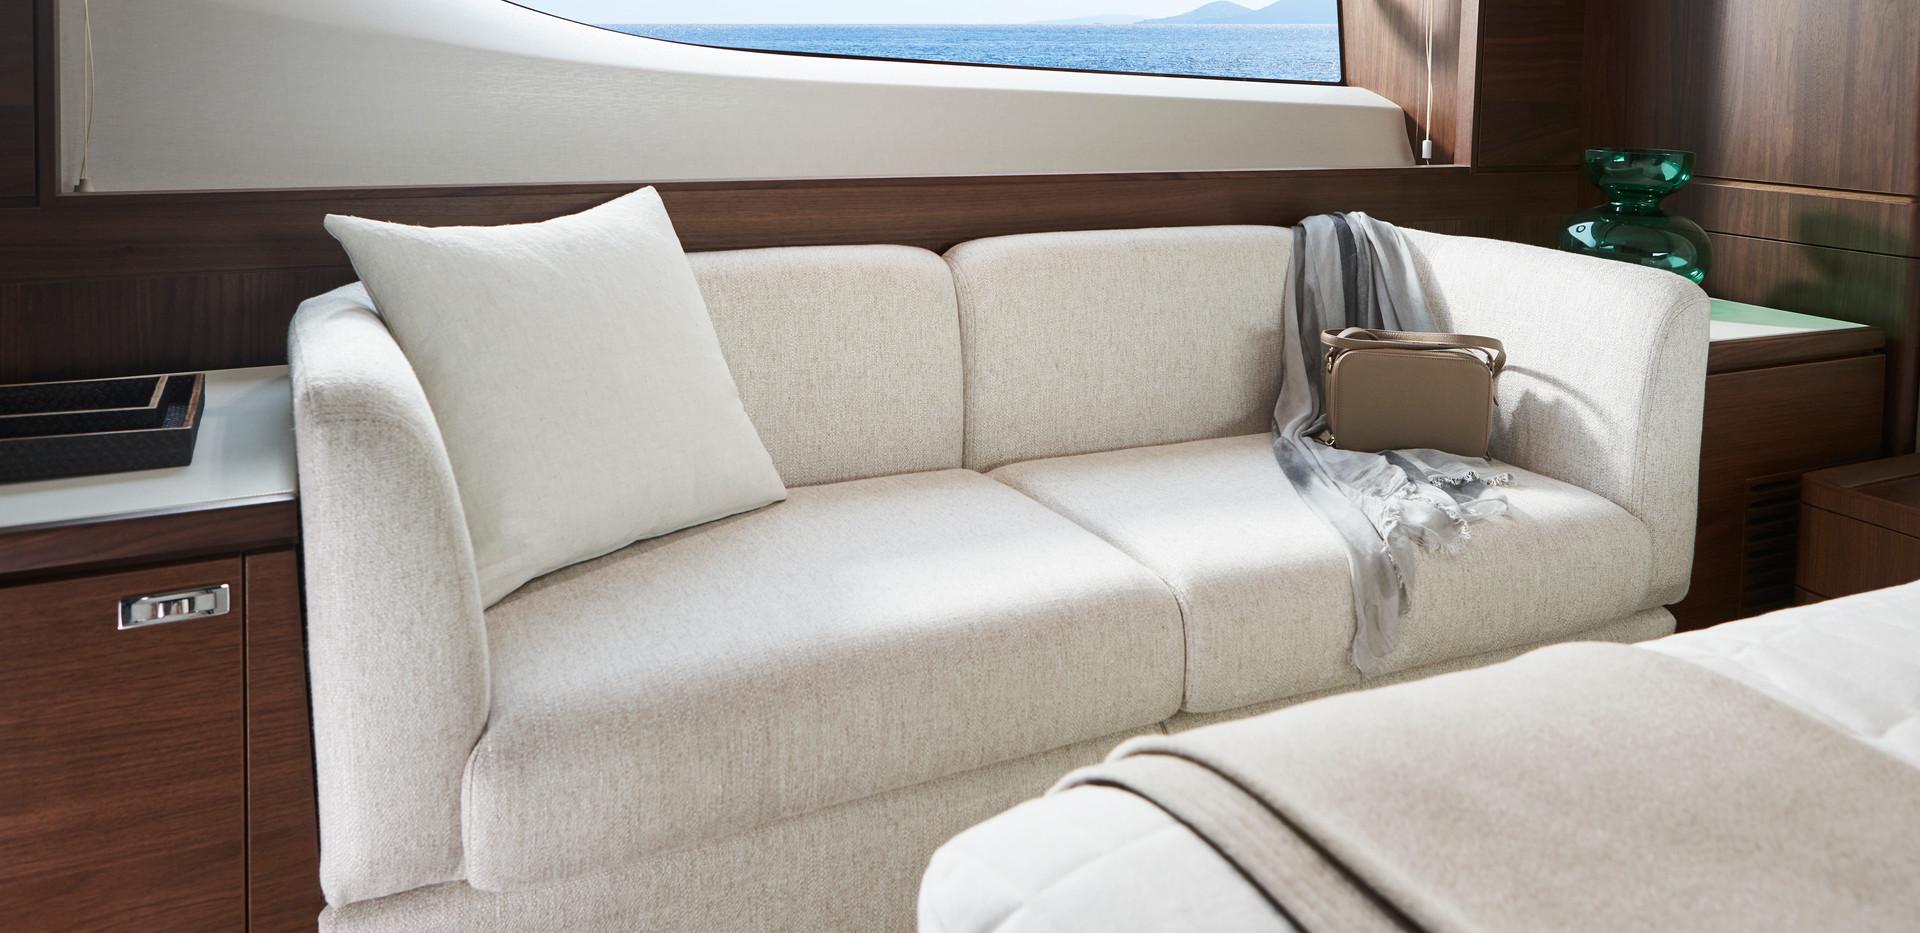 y78-interior-owners-stateroom-sofa-walnu